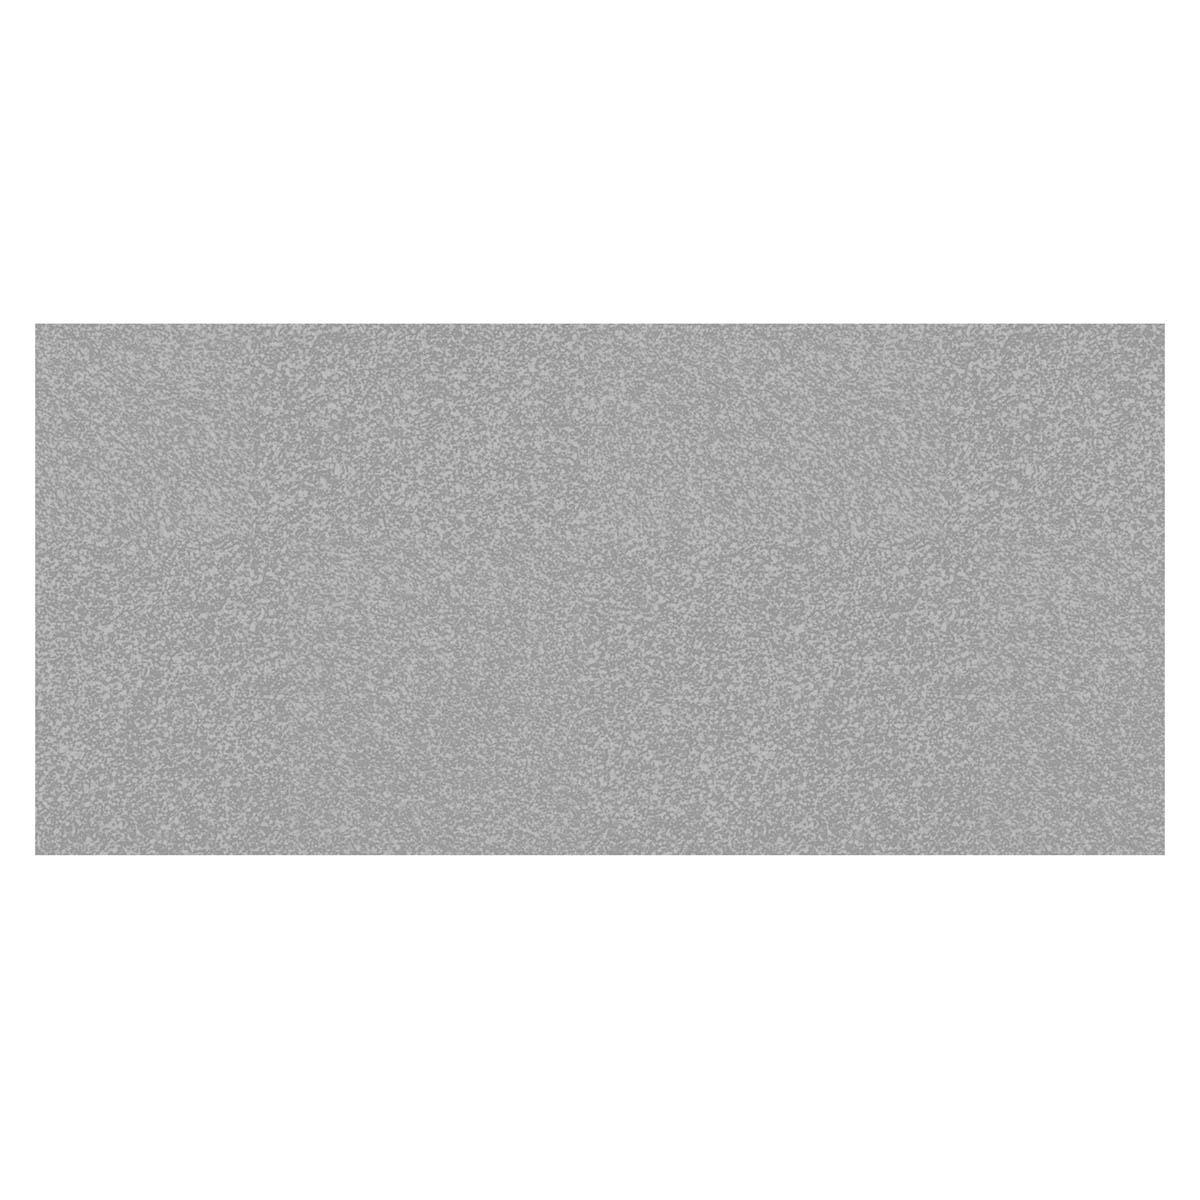 Waverly ® Inspirations Glitter Multi-Surface Acrylic Paint - Silver, 2 oz. - 60937E